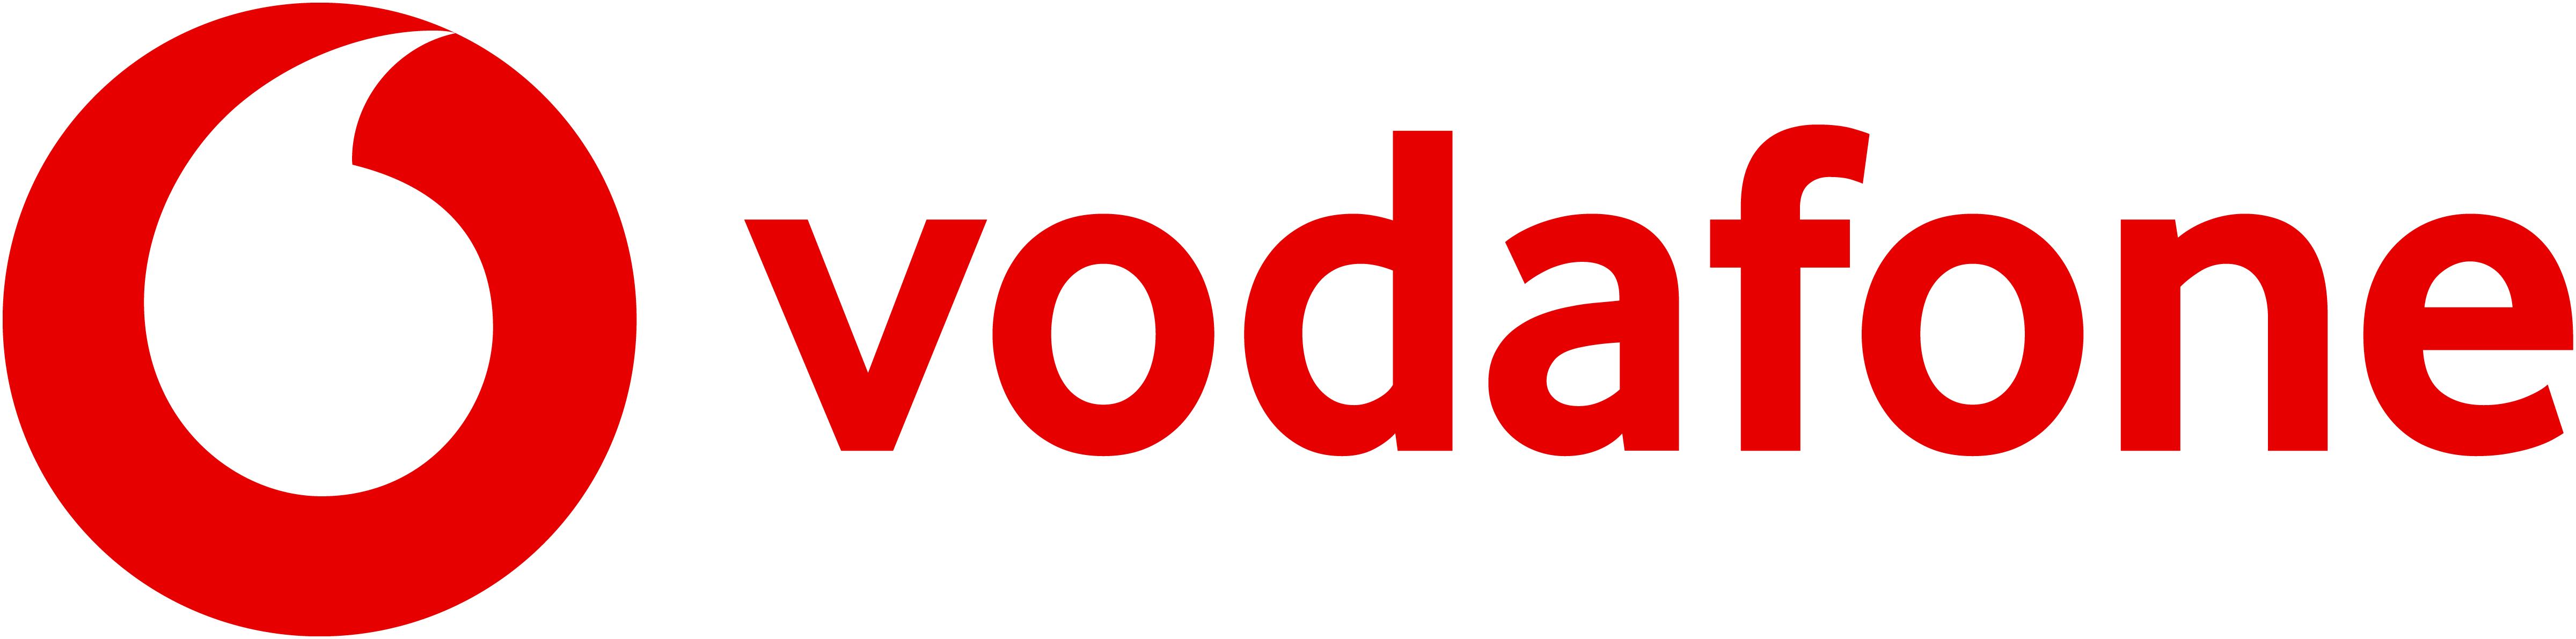 https://www.kwg-helmstedt.de/media/Logo_Vodafone.jpg